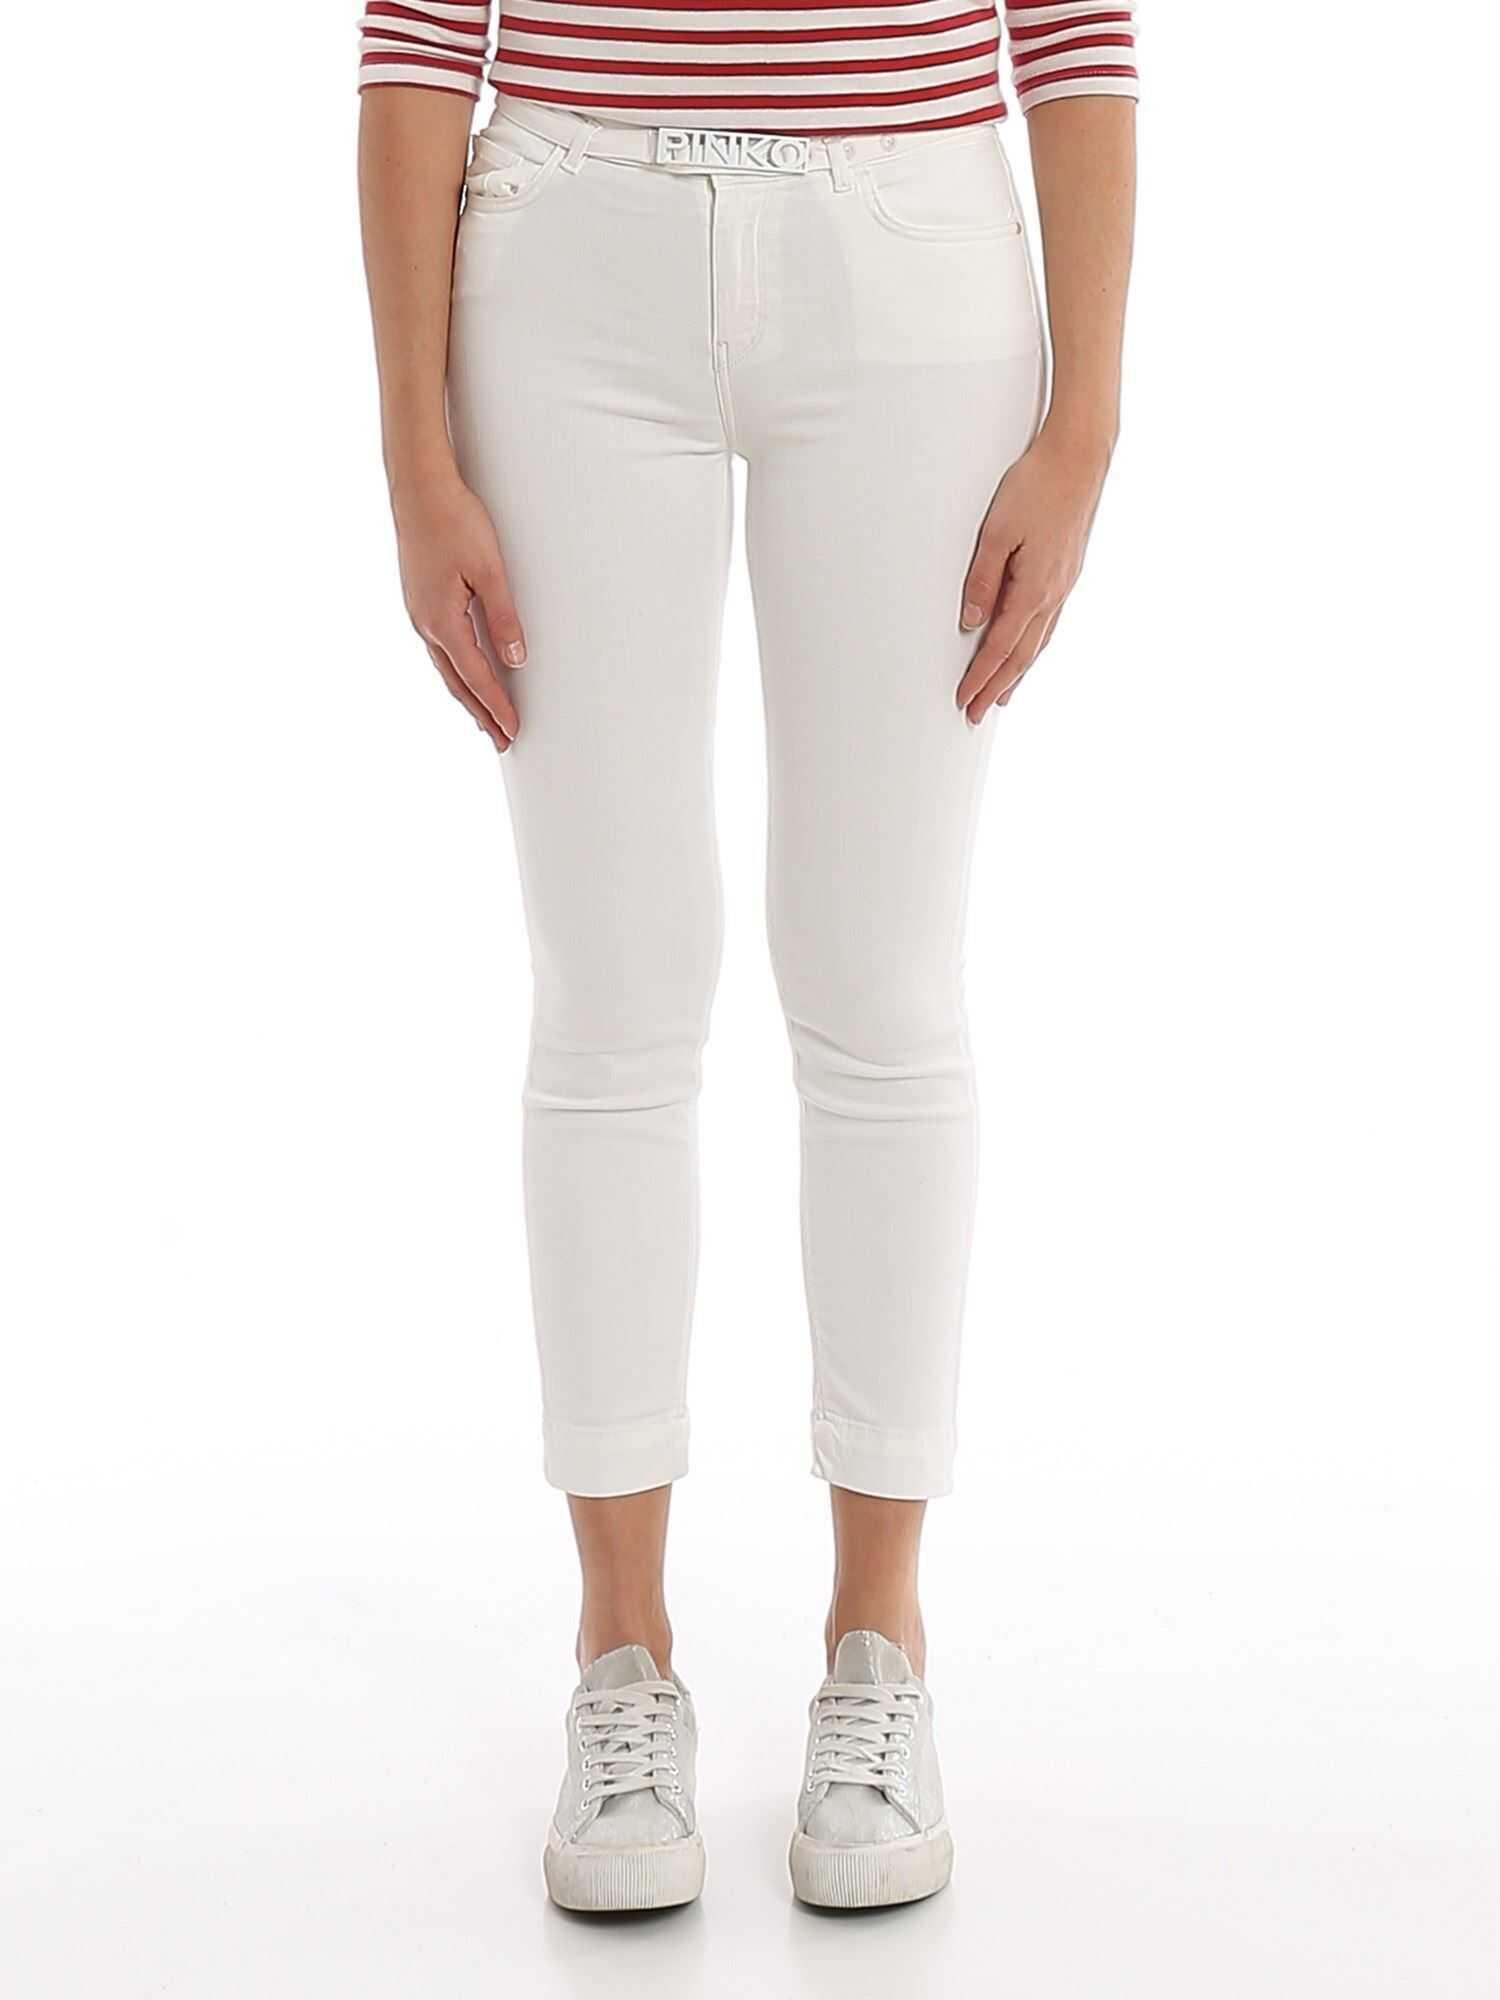 Pinko Sabrina Jeans With Logo Bucked Belt White